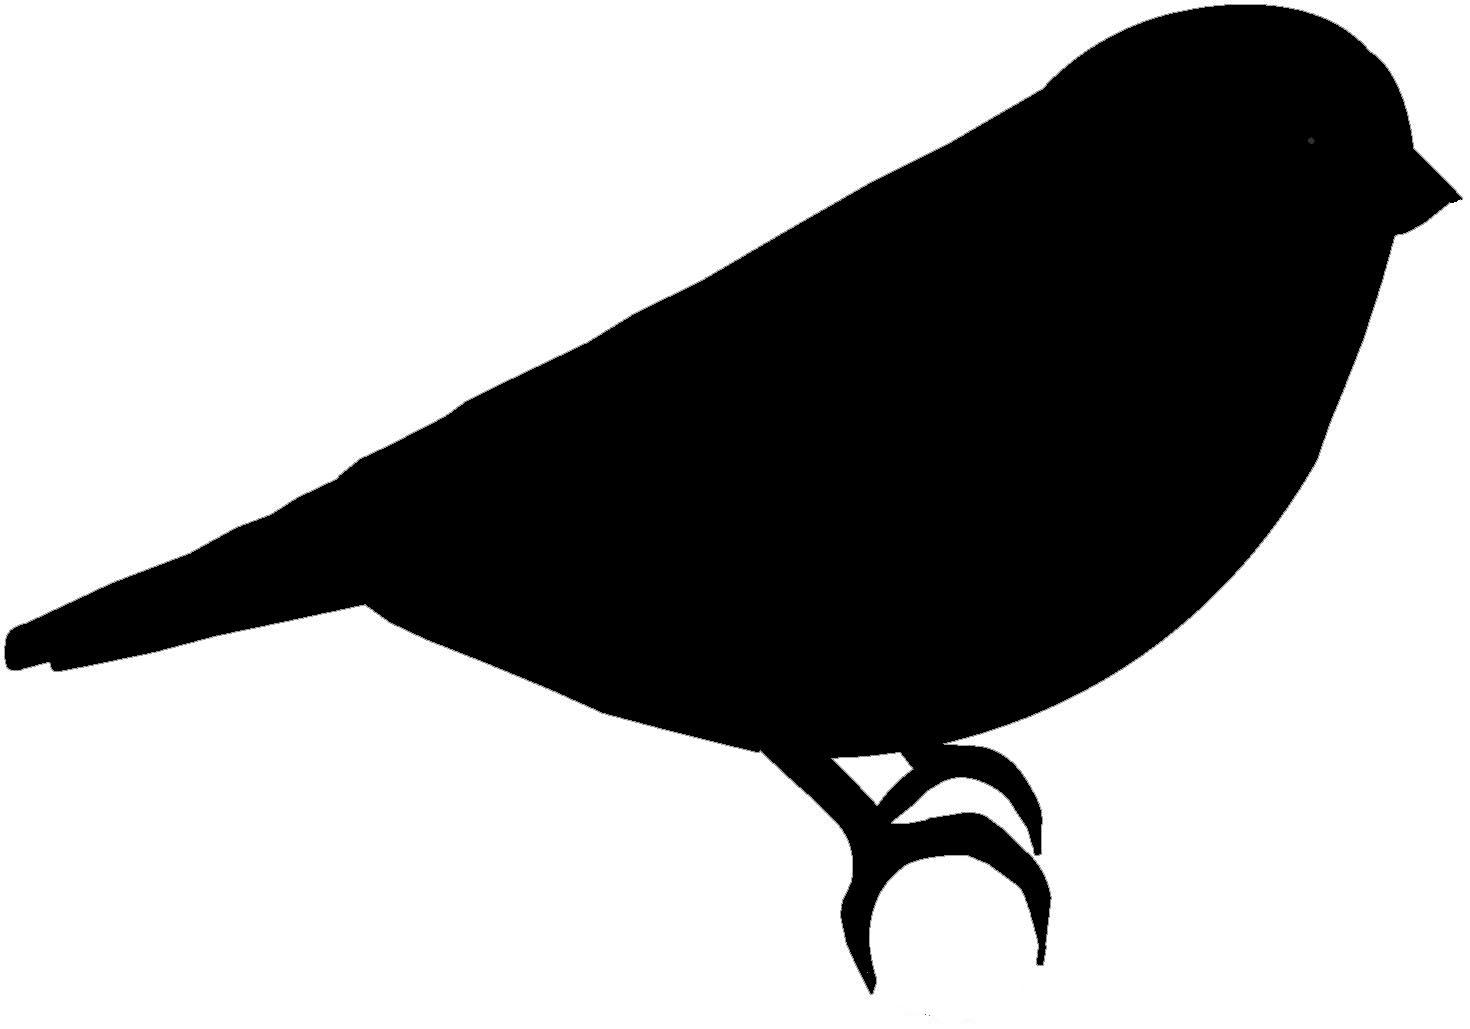 1470x1029 Bird Silhouette